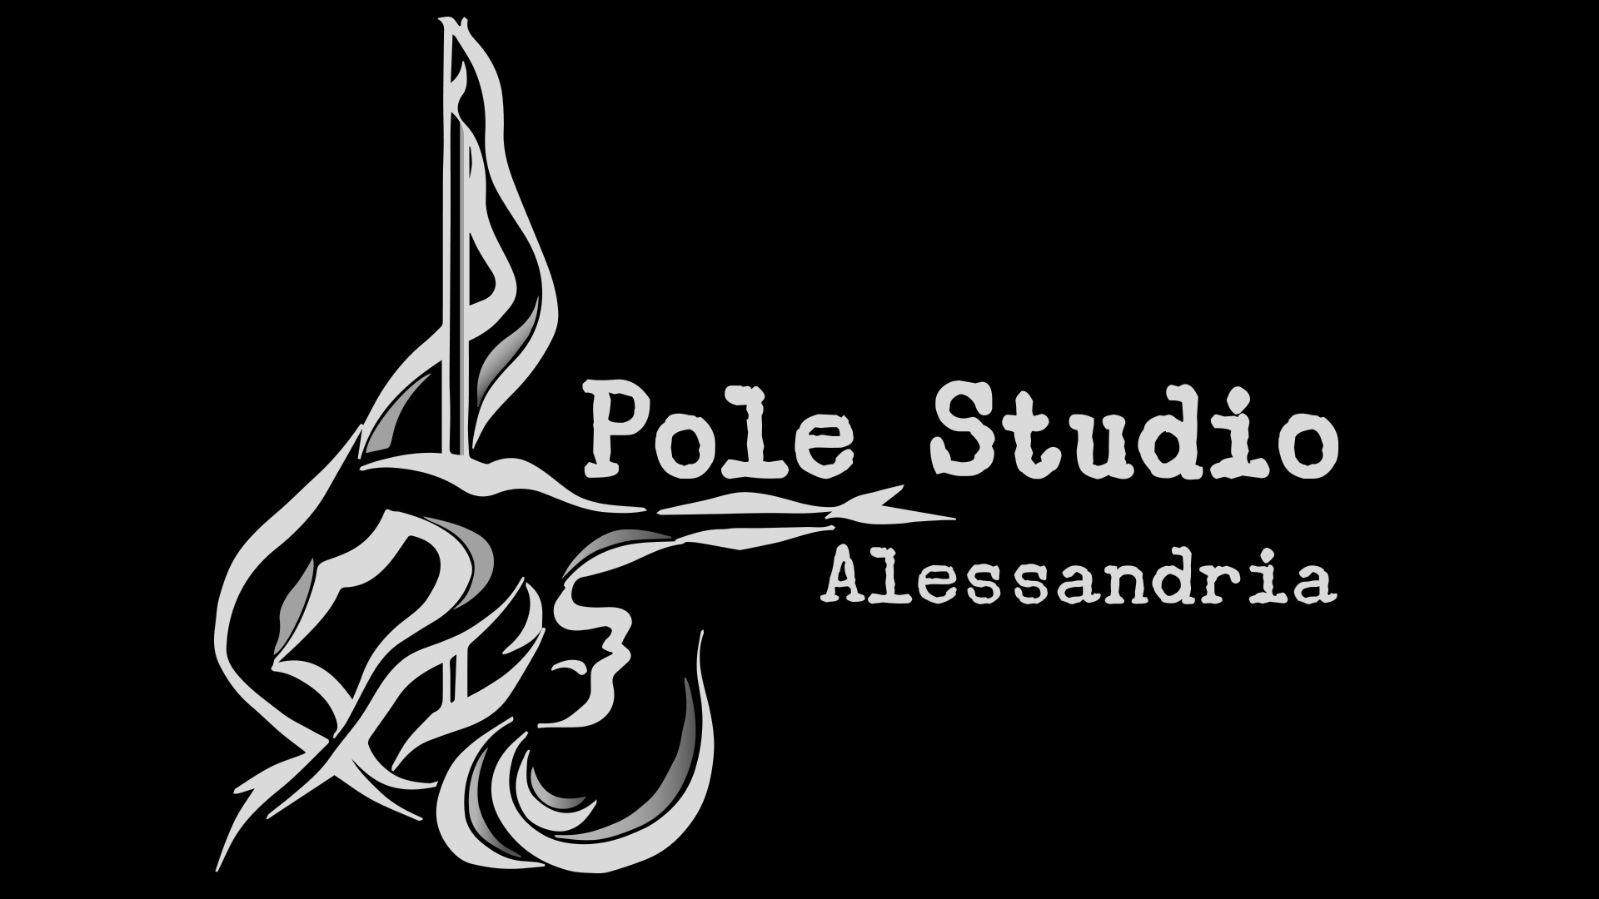 Pole Studio Alessandria